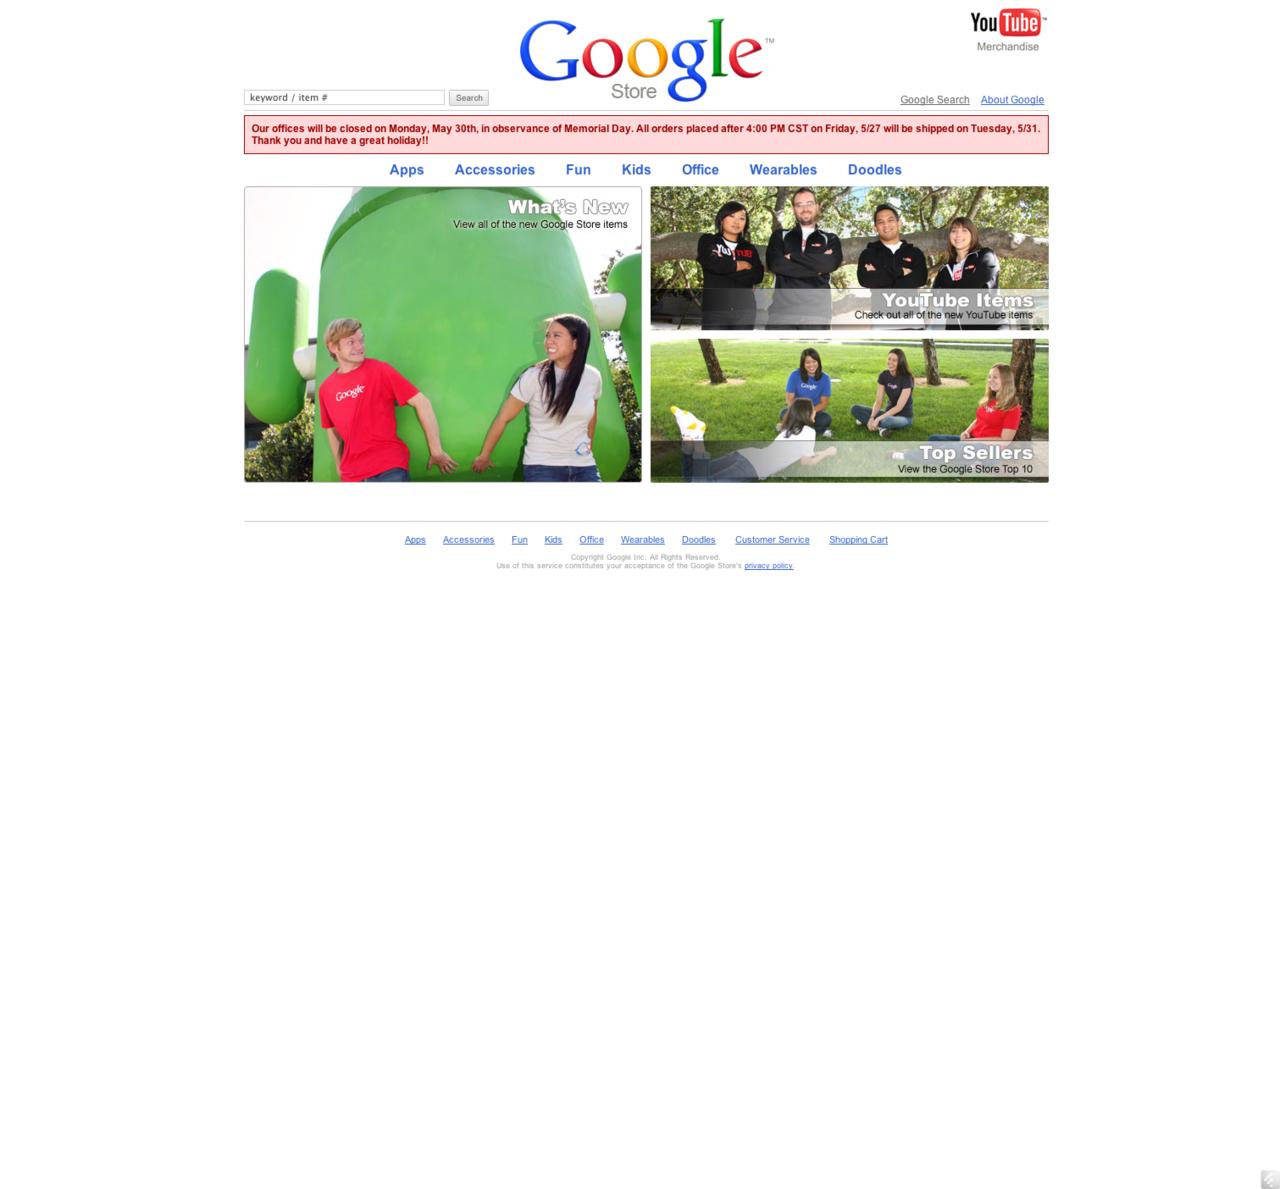 www.googlestore.com